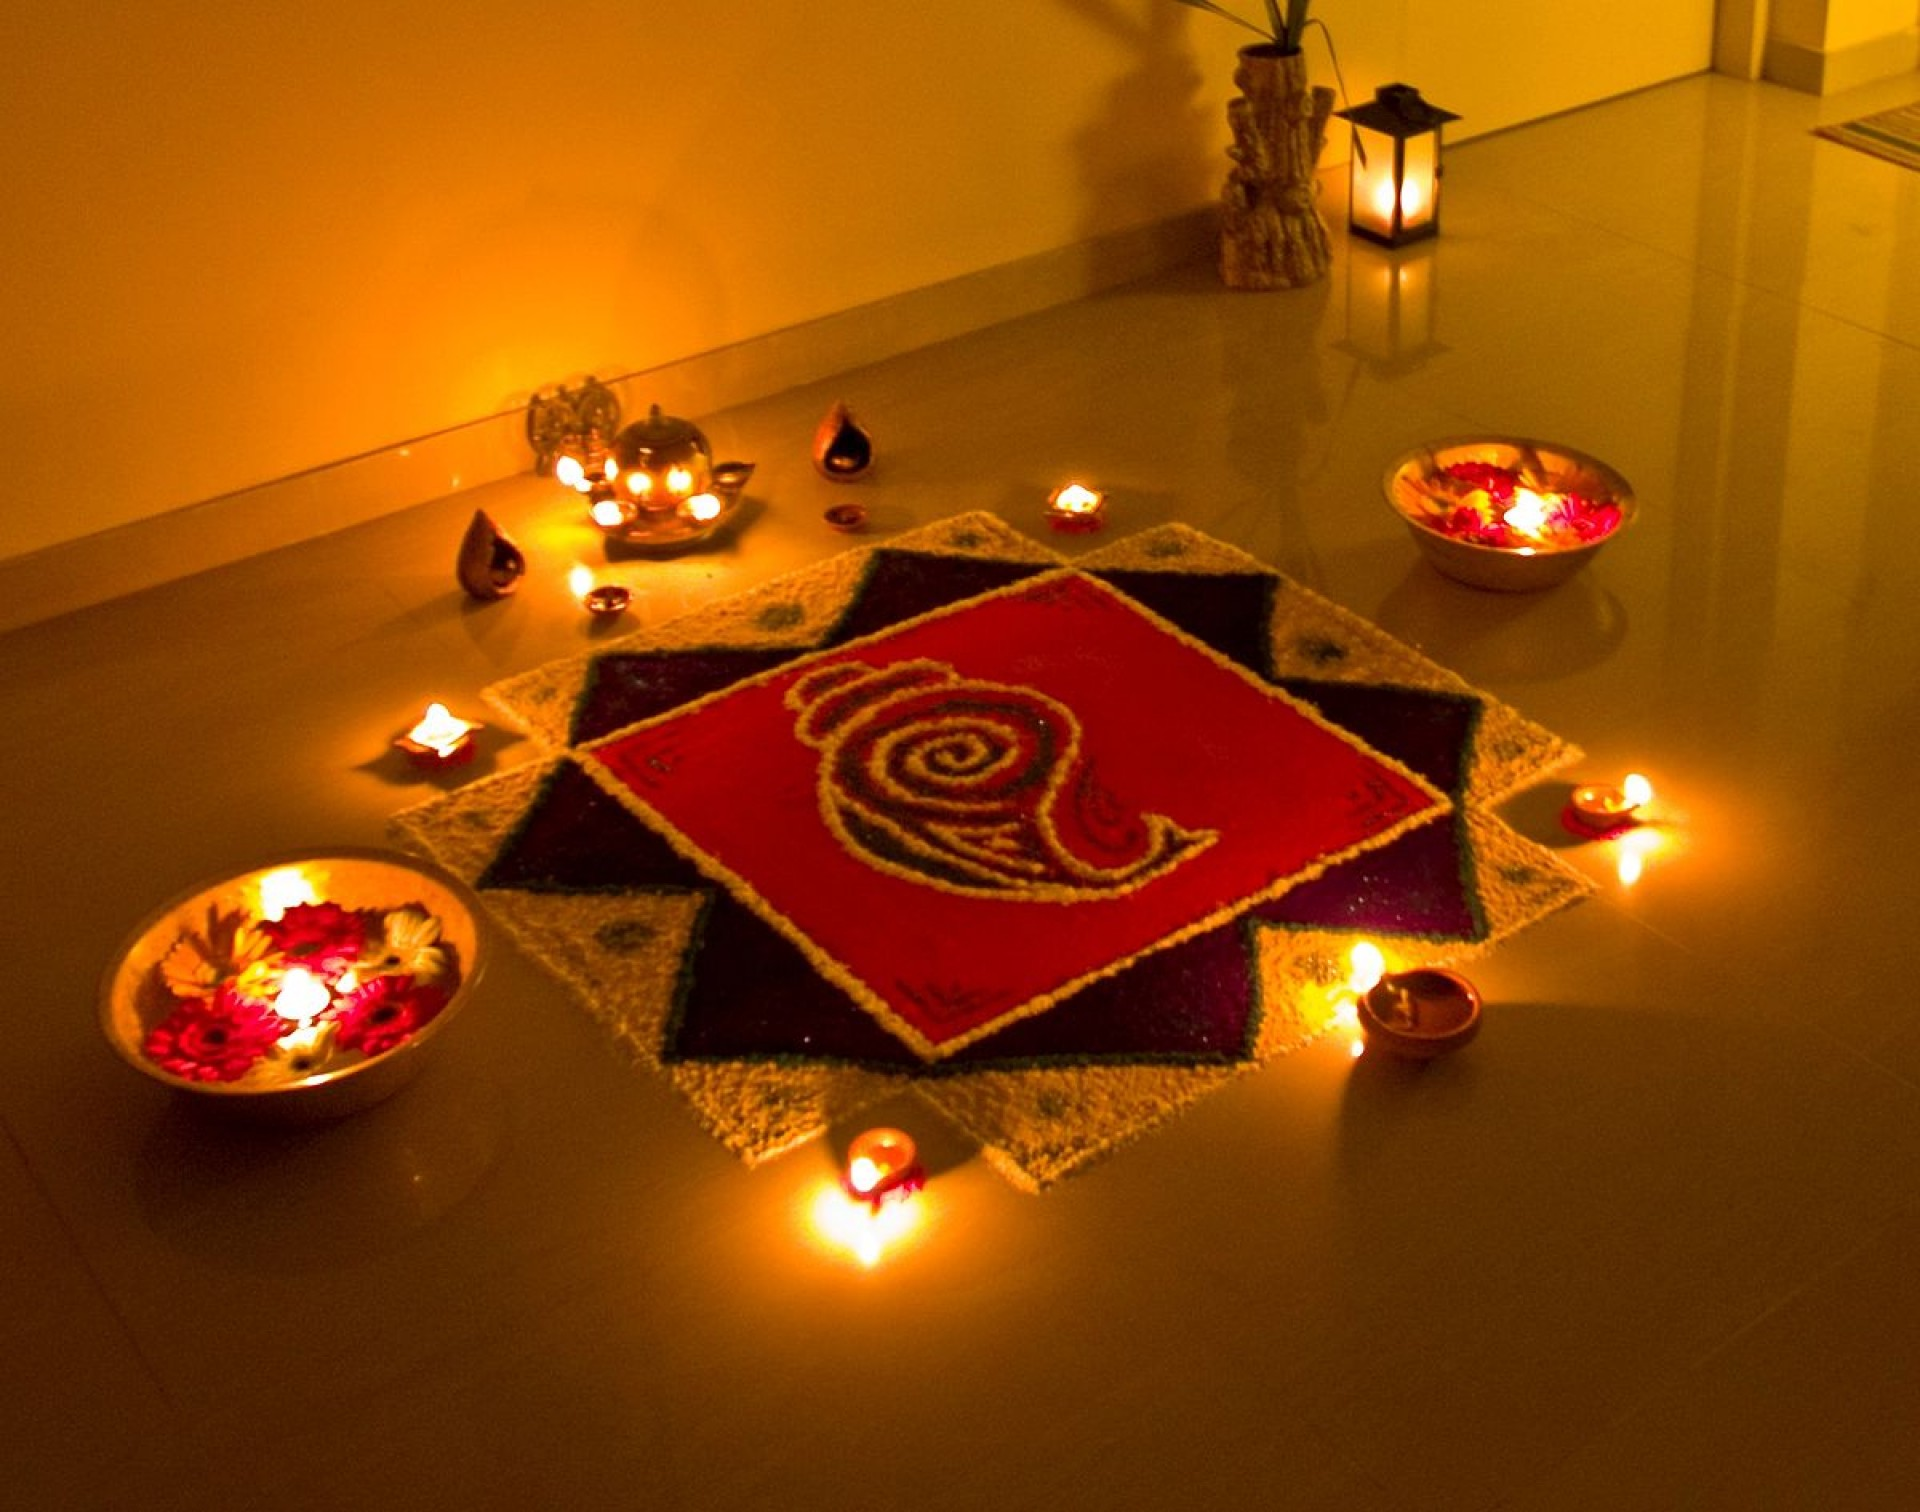 017 Essay Example Deepavali Festival In Tamil 1200px The Rangoli Of Lights Unbelievable Christmas Language Diwali 1920